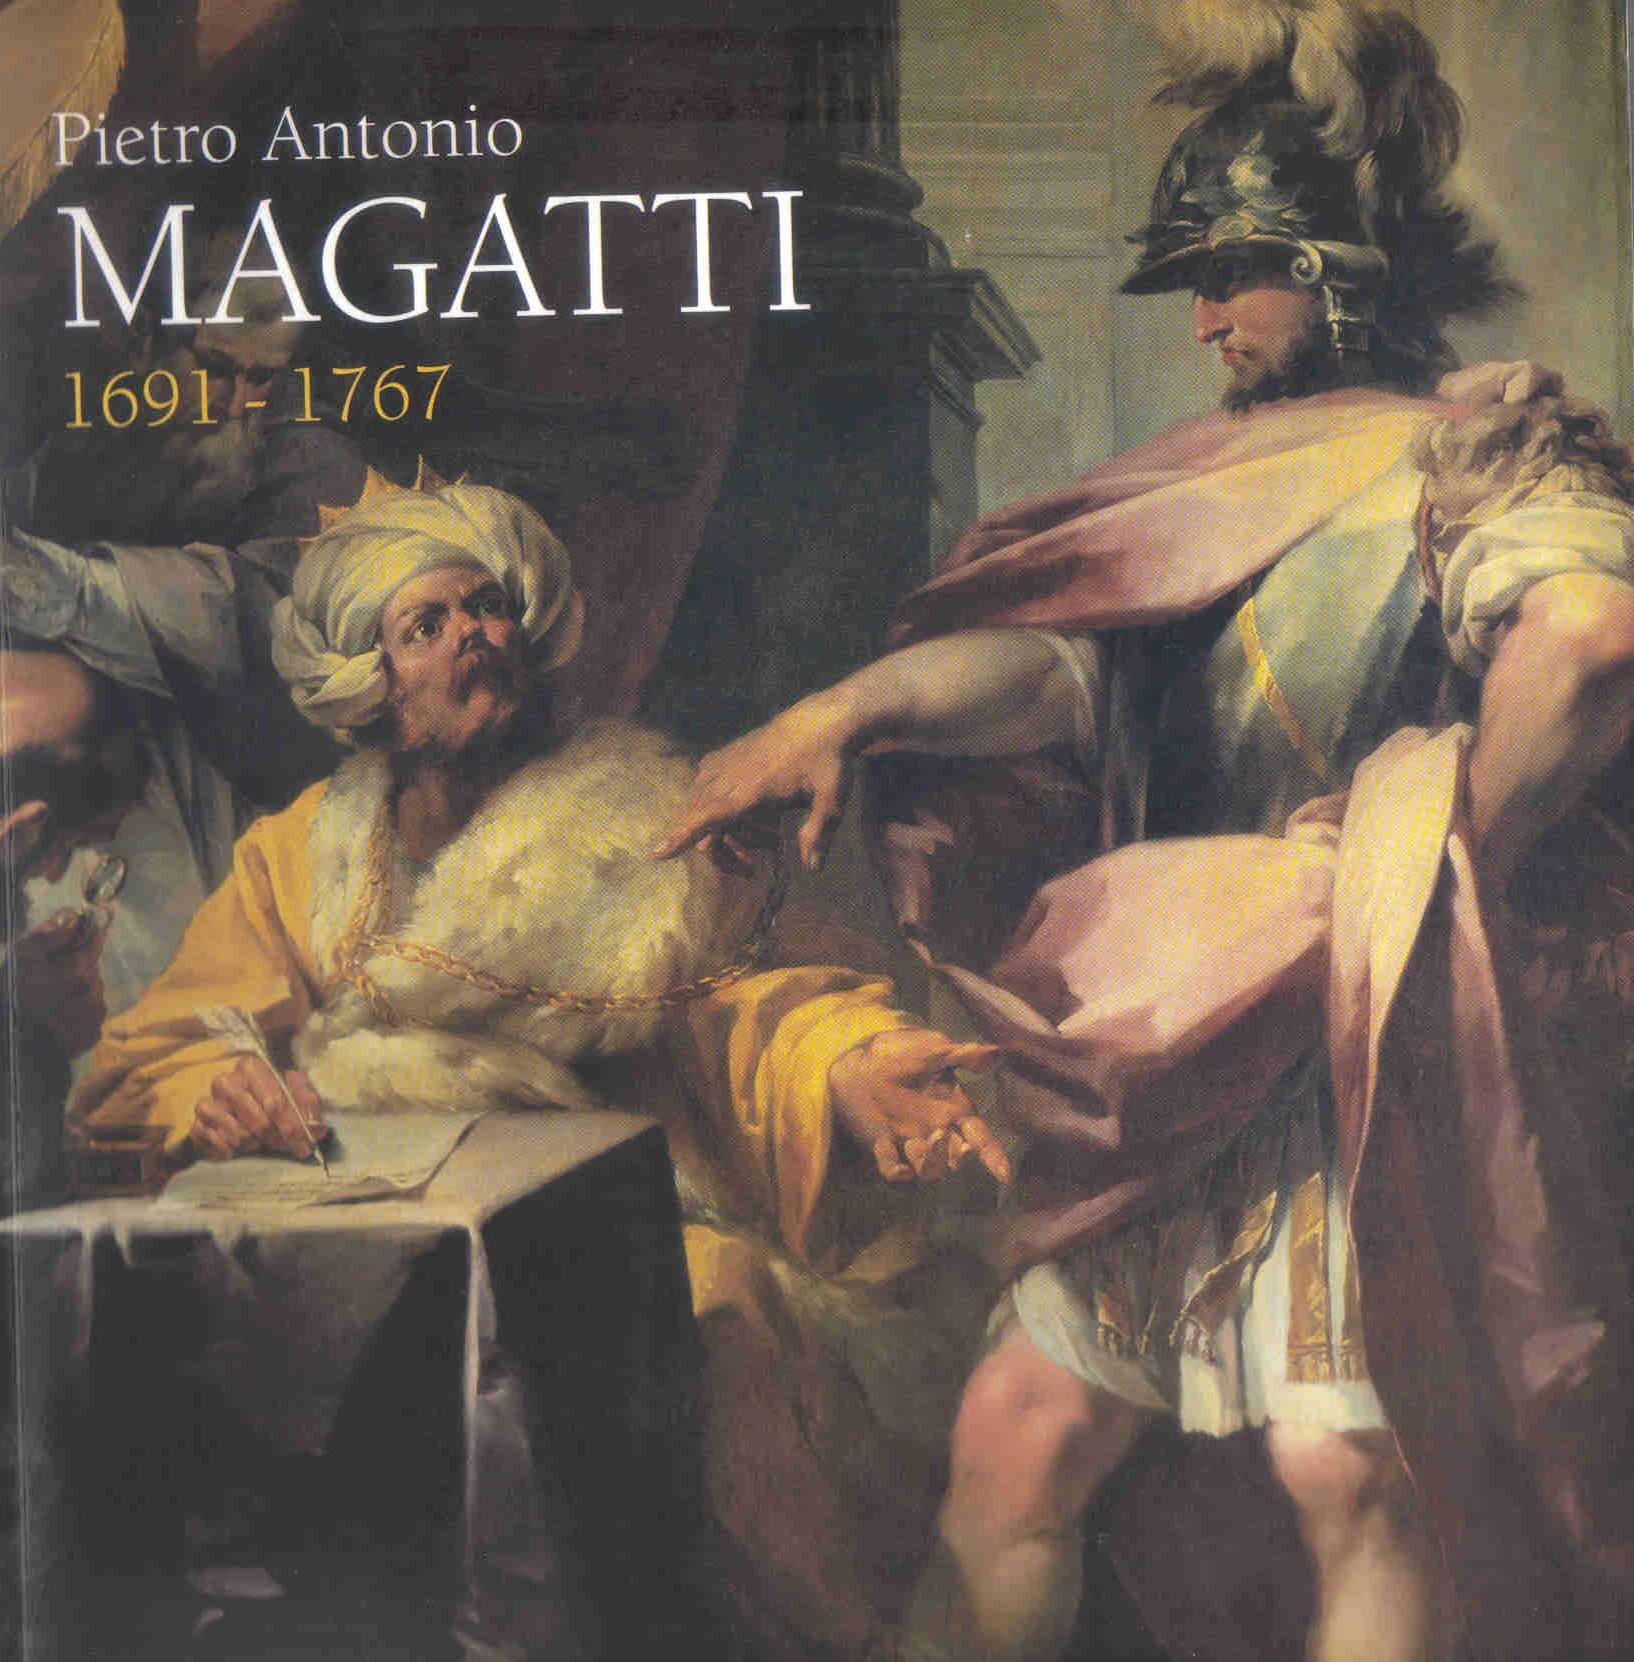 Pietro Antonio Magatti